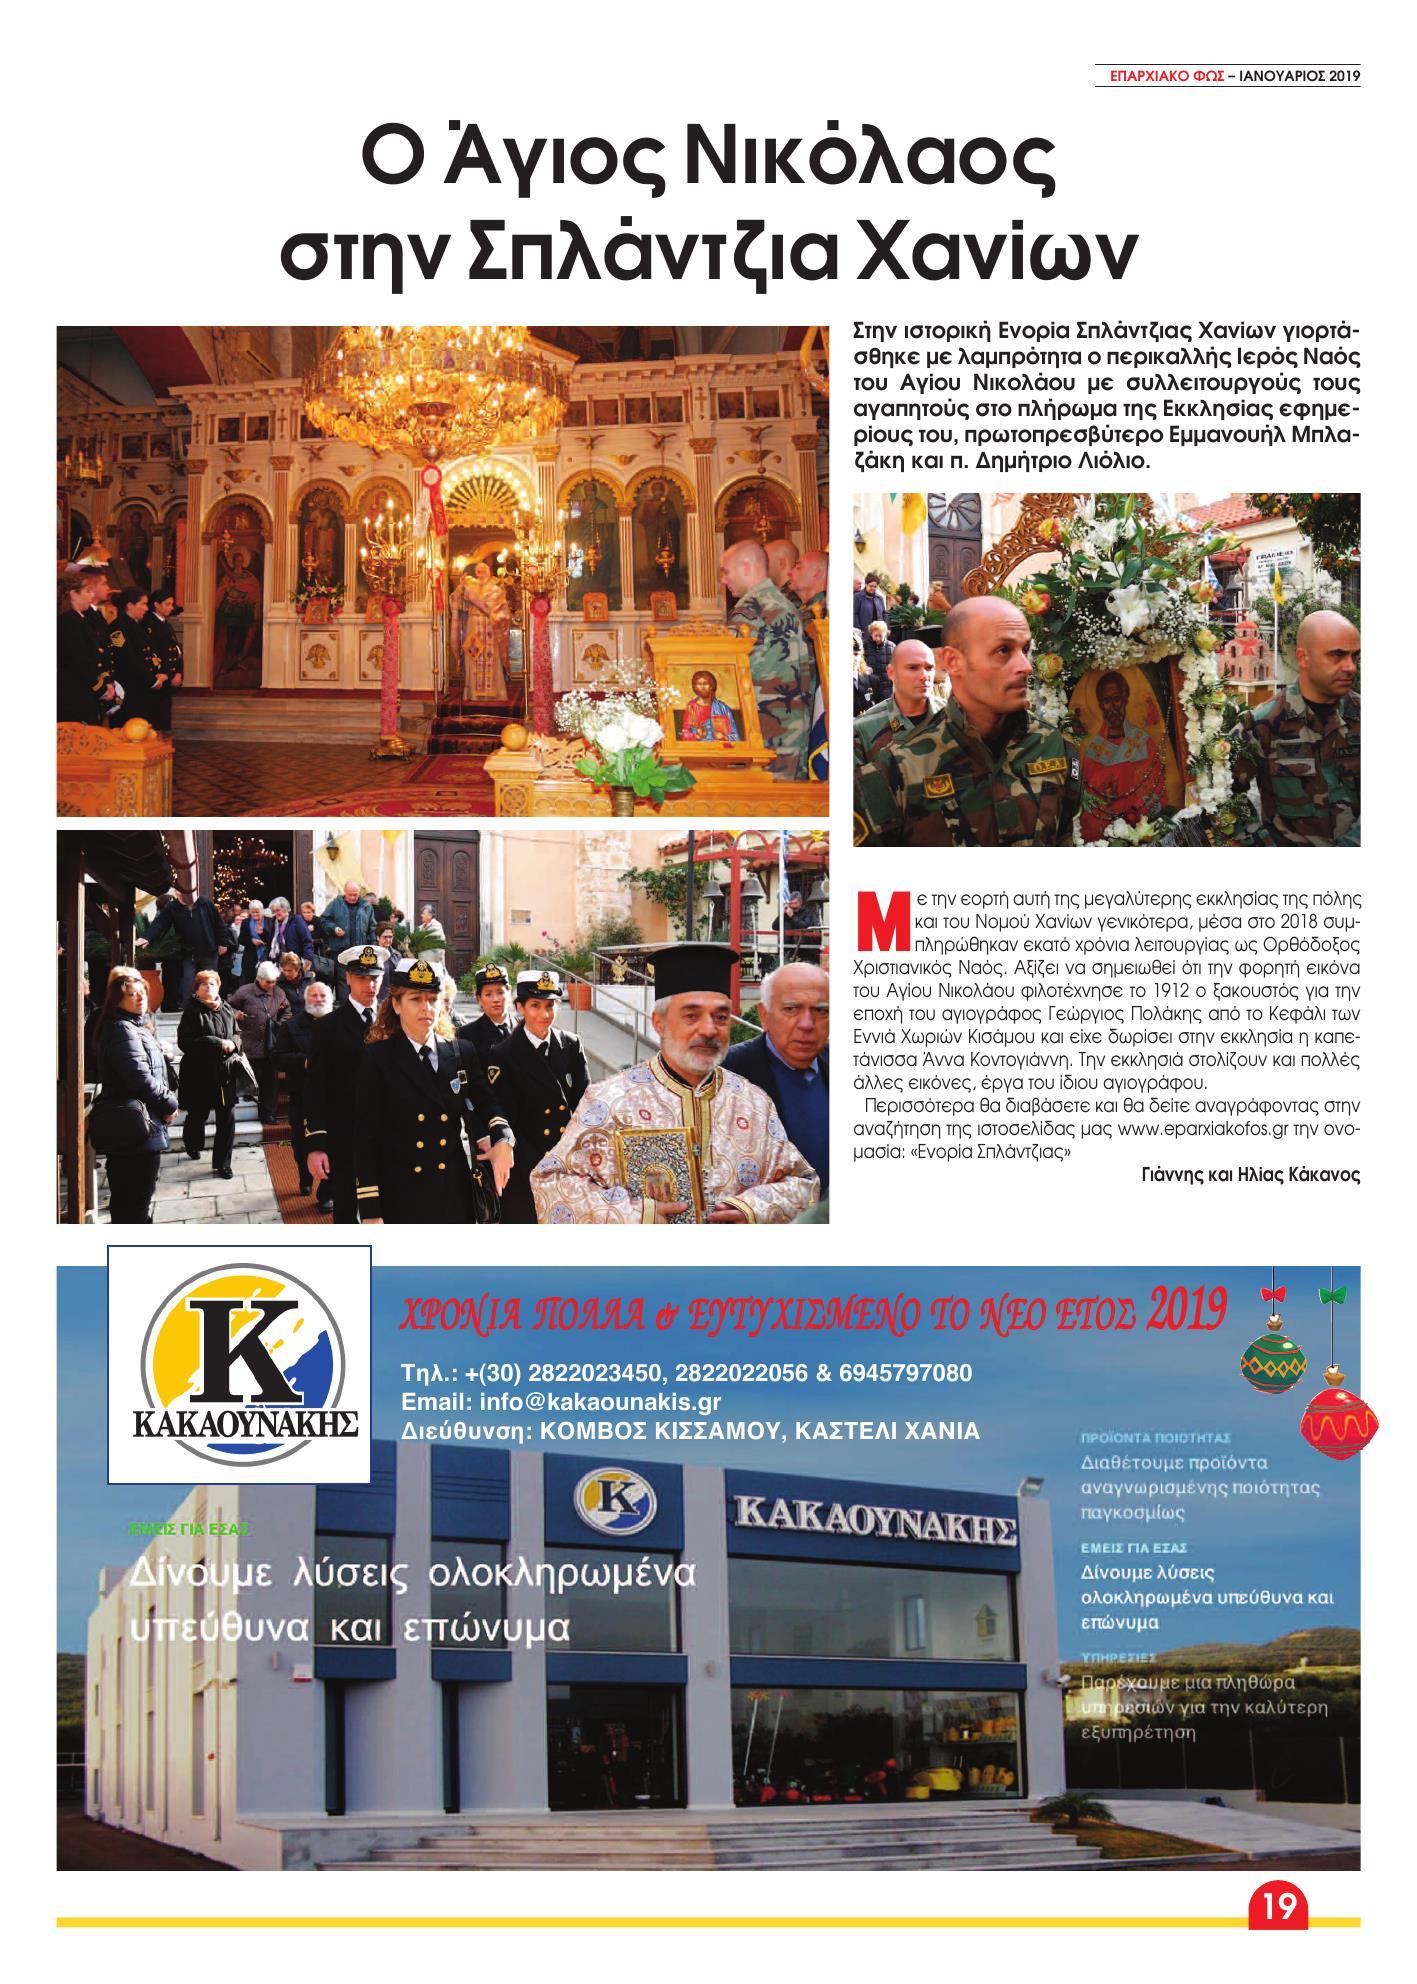 23 KAKANOULHS (Page 19)